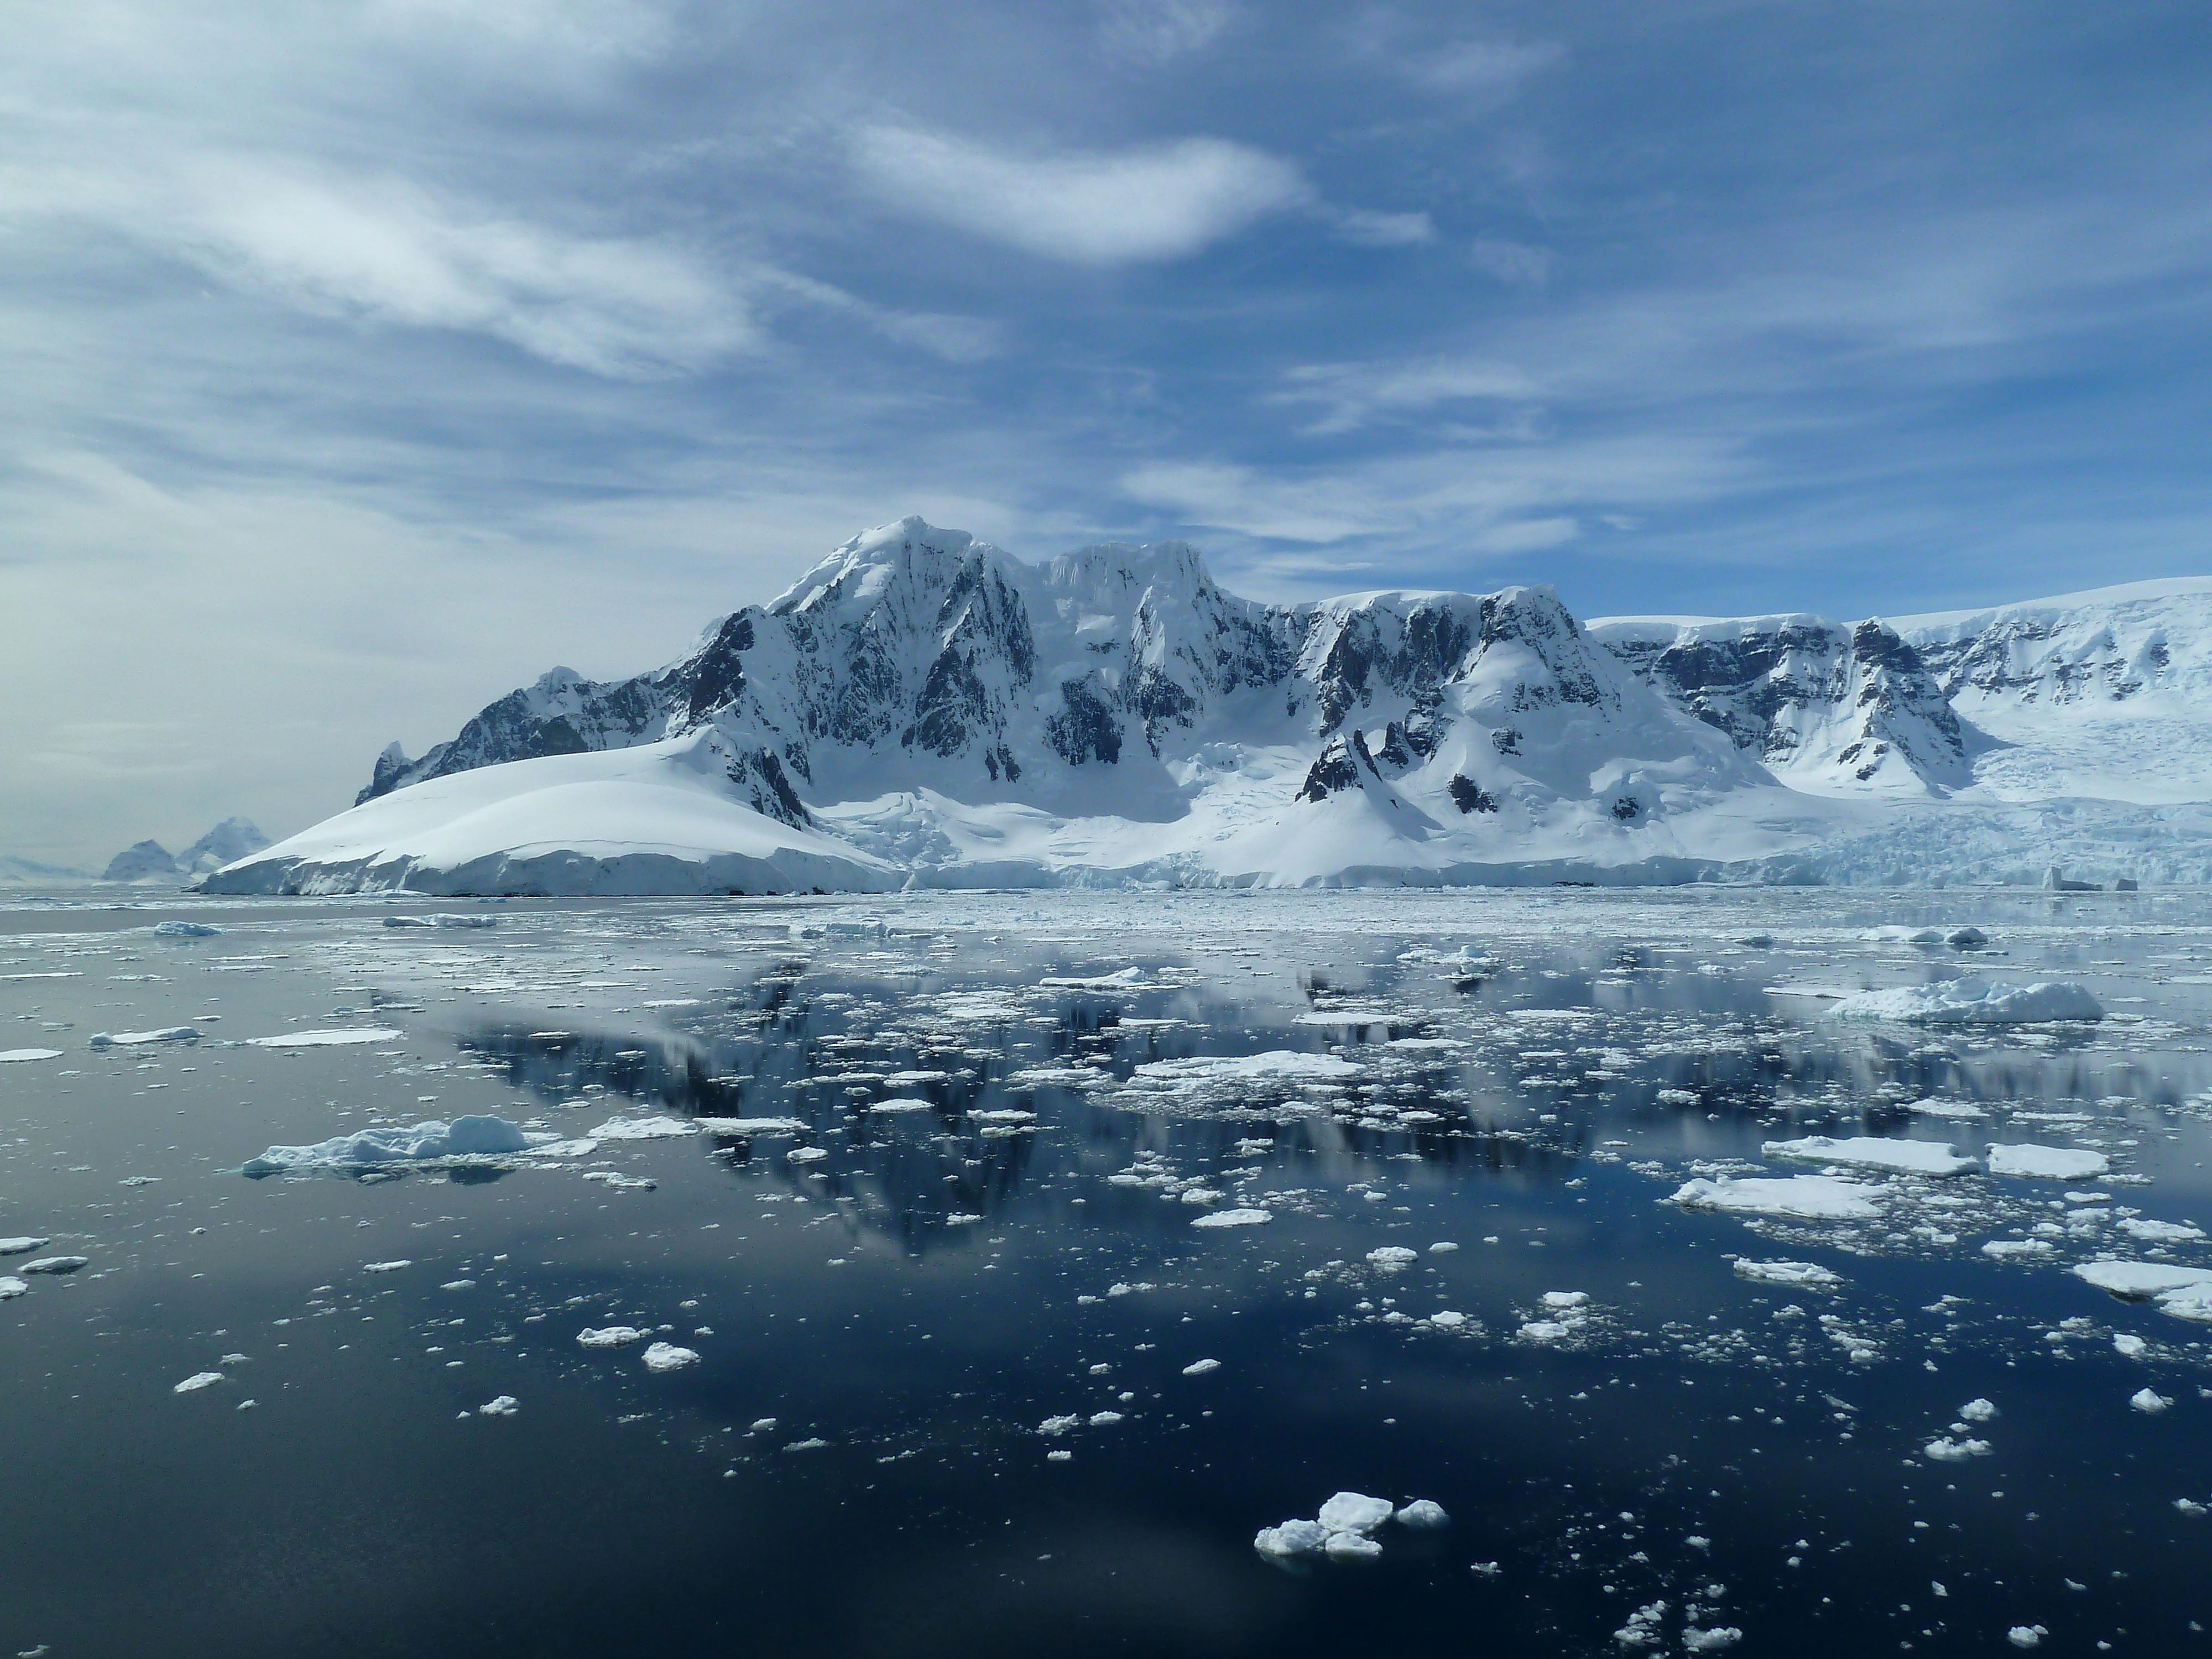 A sunny day on Antarctica.